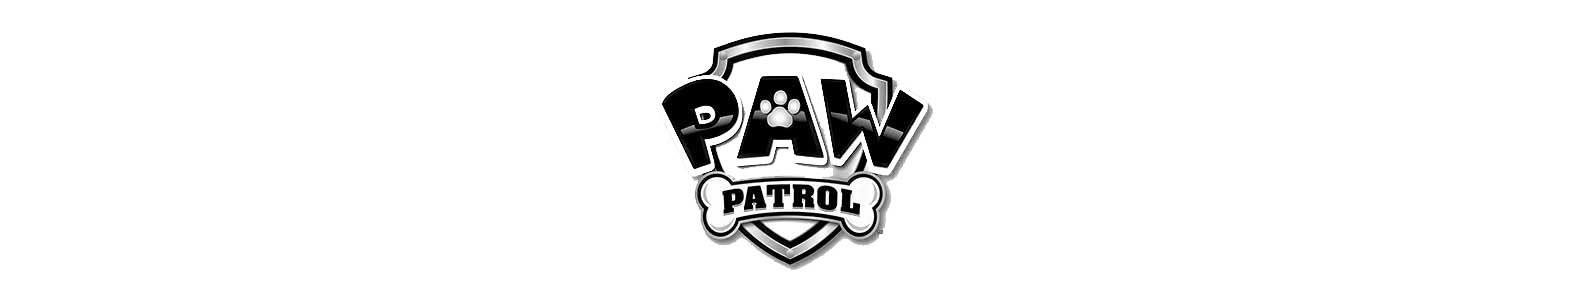 Paw Patrol brand header image